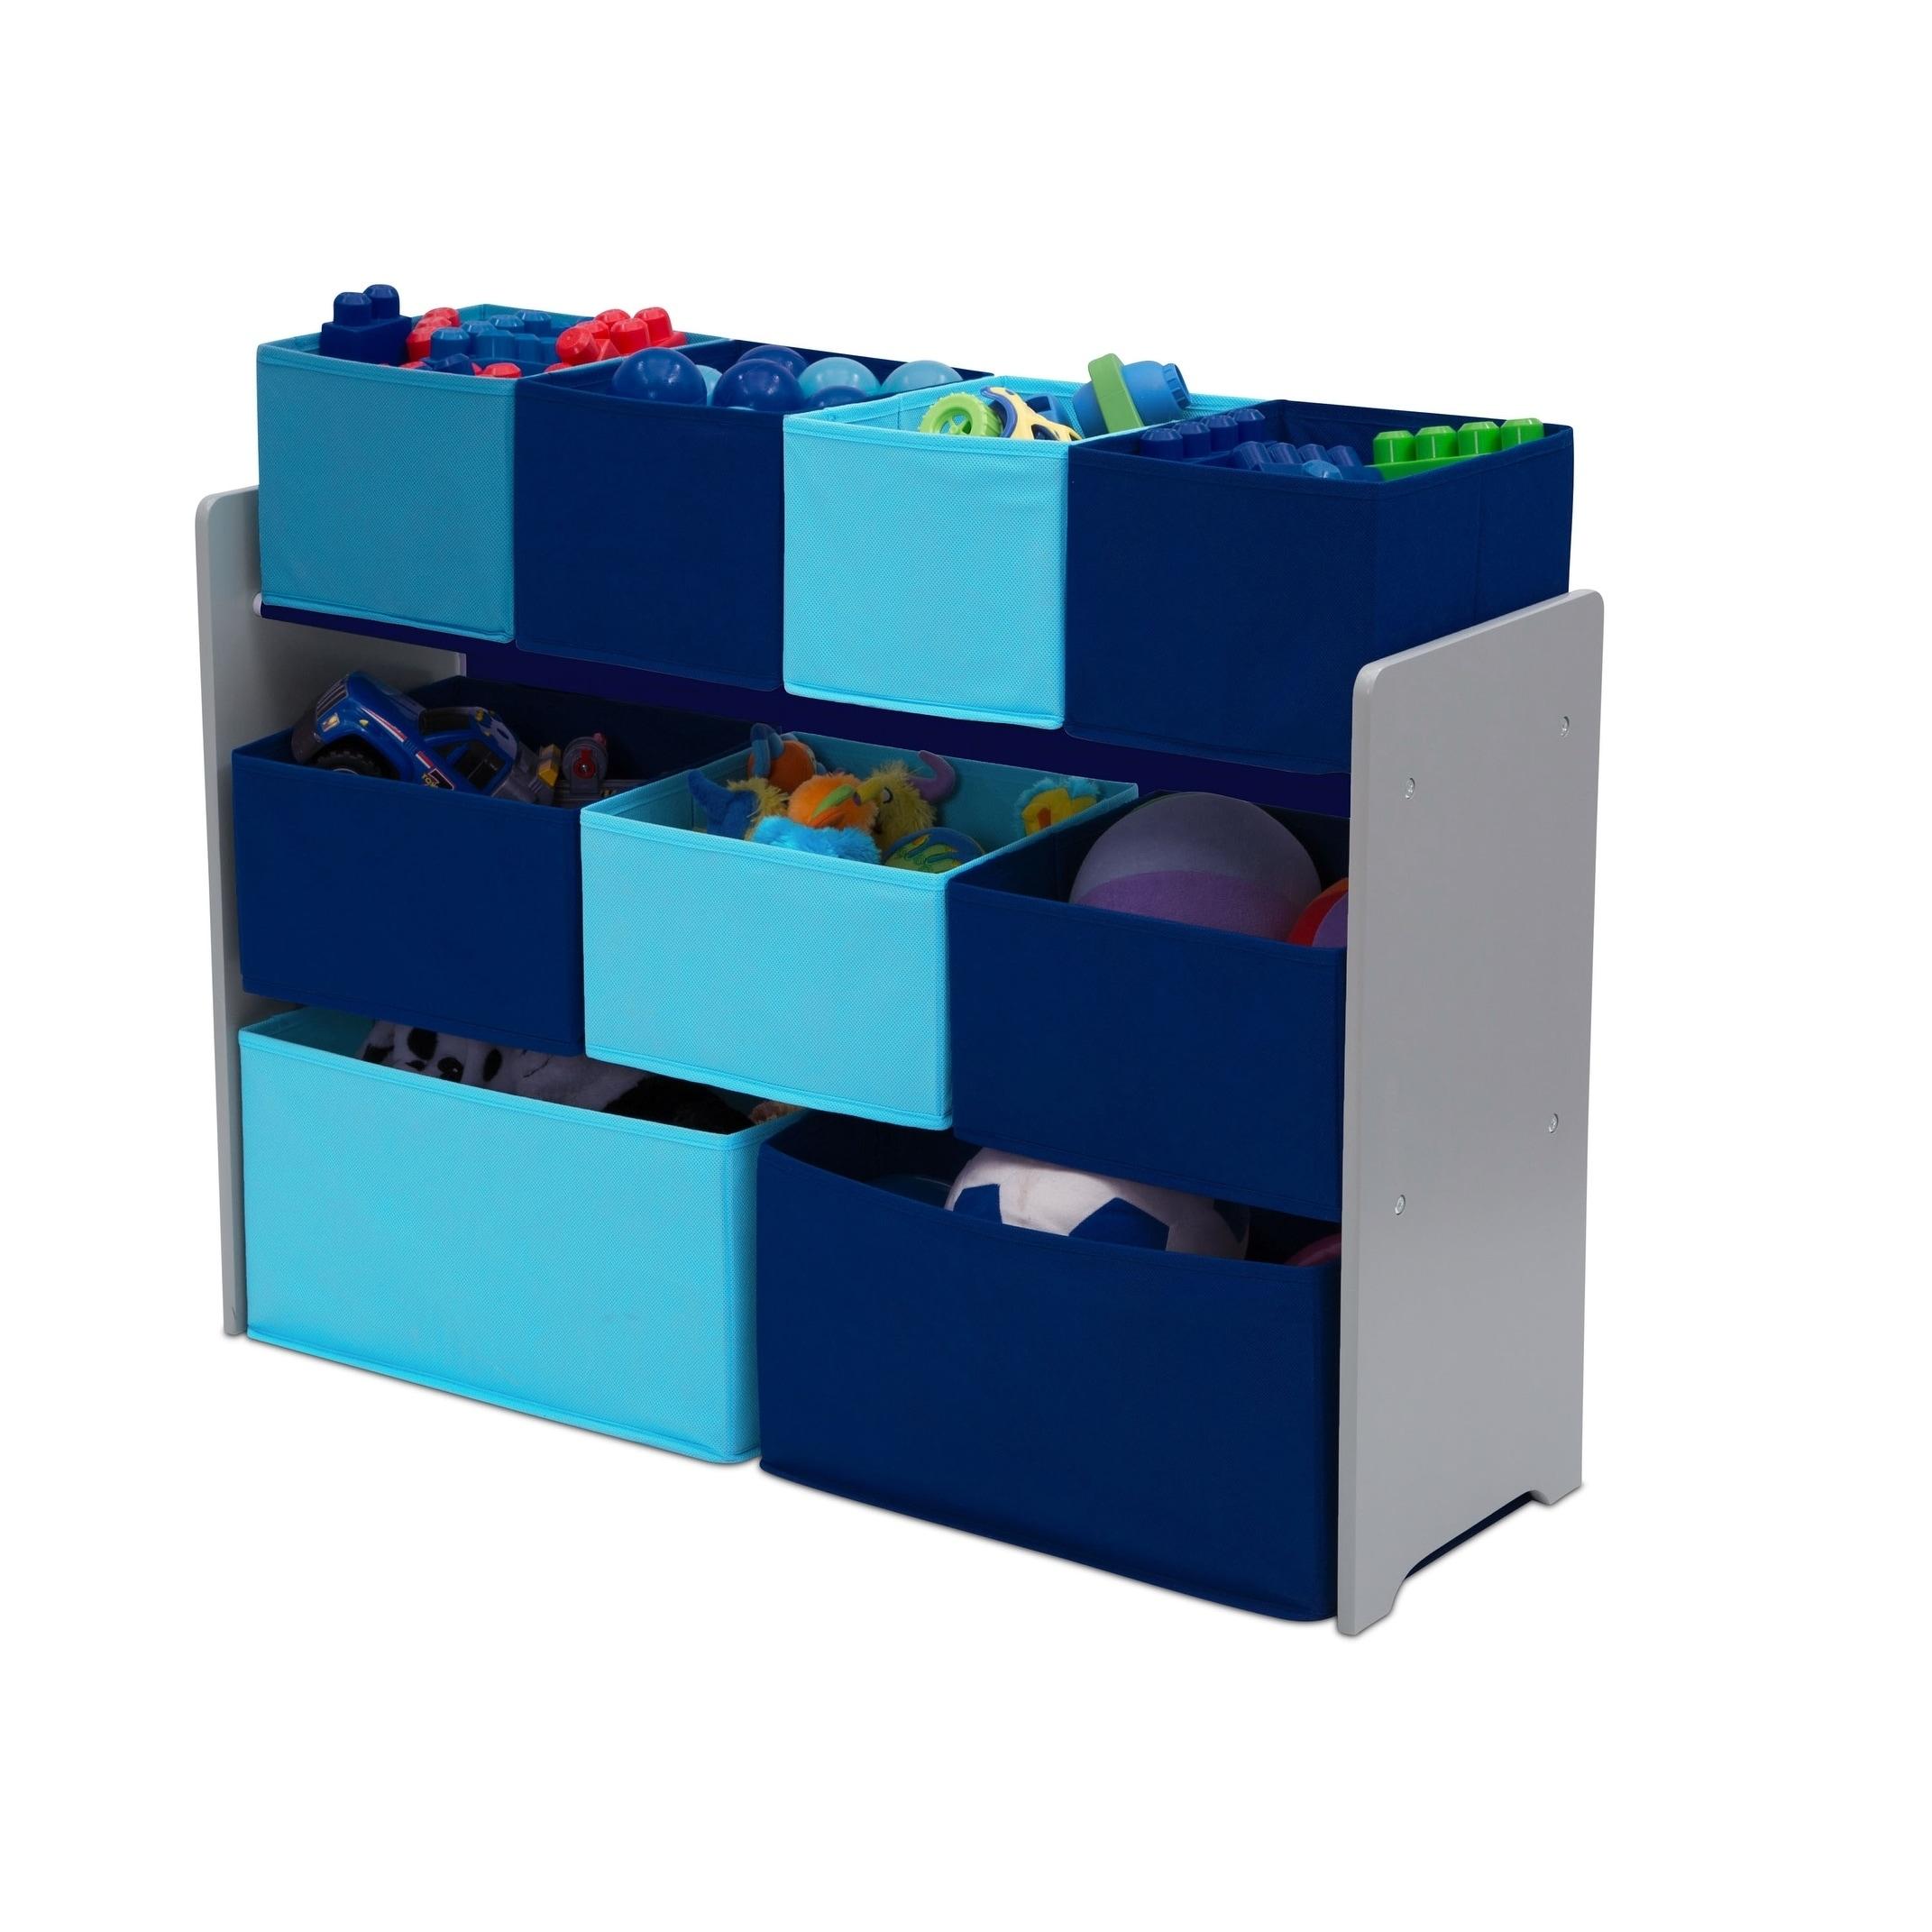 Shop Delta Children Deluxe Multi Bin Toy Organizer With Storage Bins, Grey/Blue  Bins   Free Shipping Today   Overstock.com   17158969